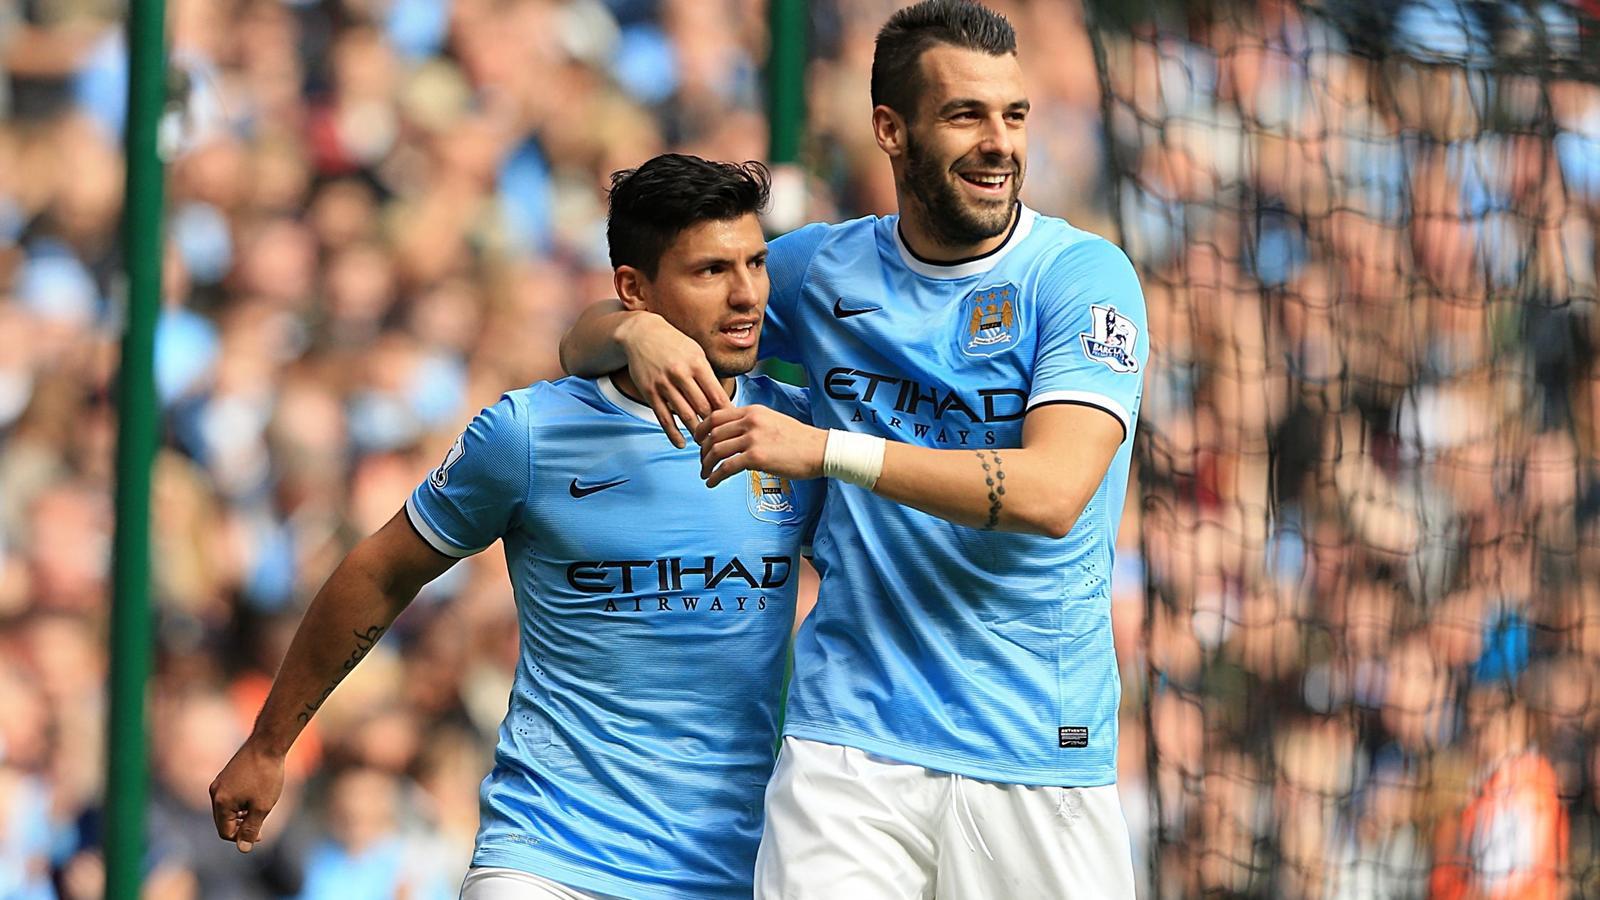 Manchester city s sergio aguero left celebrates with teammate alvaro